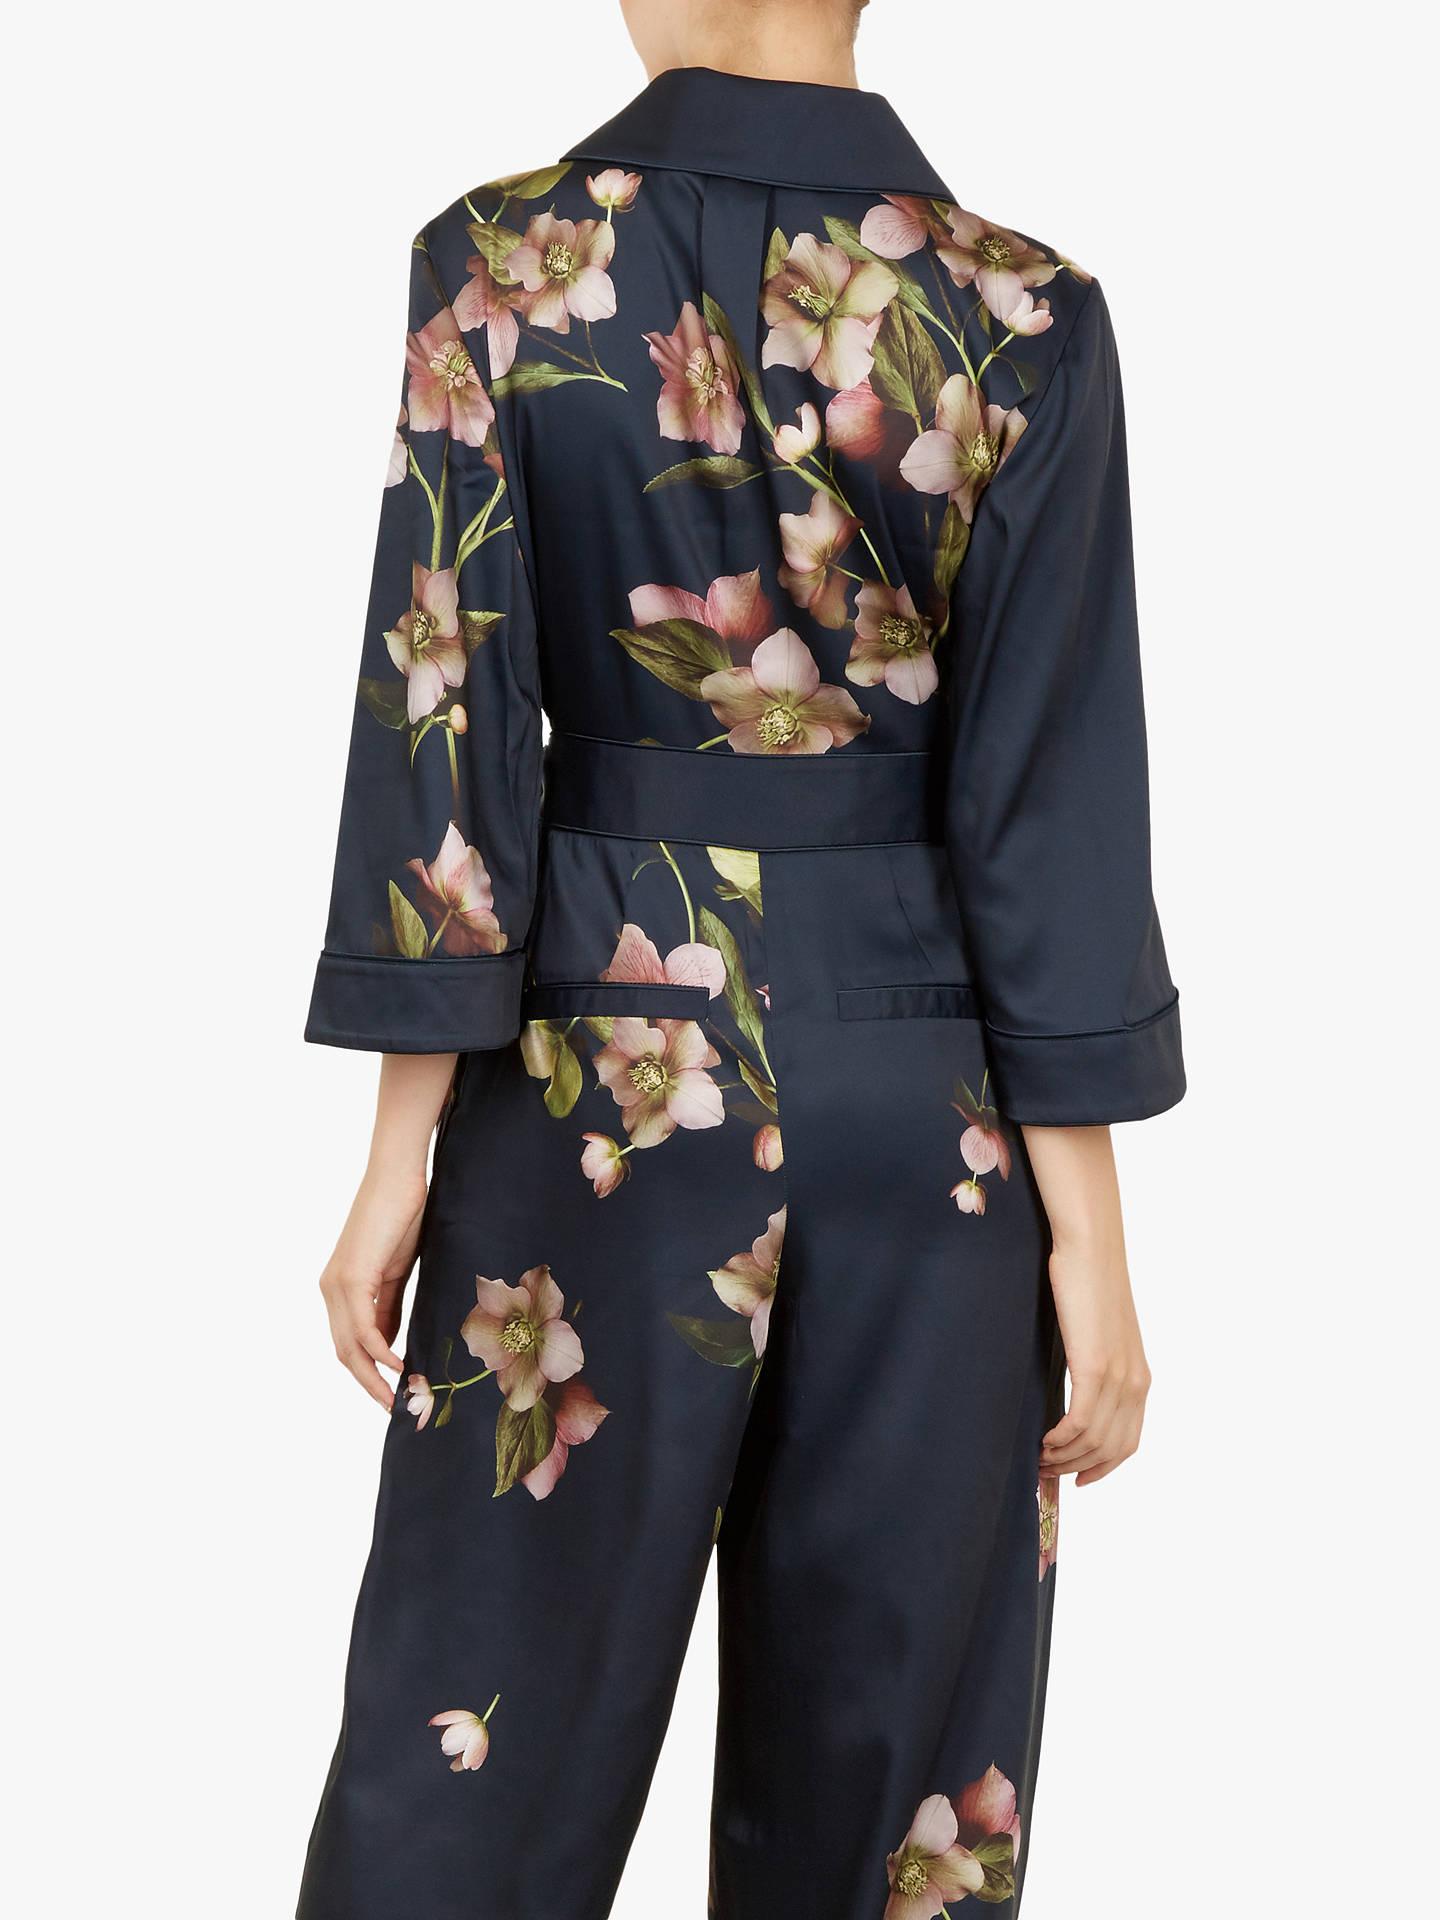 69aec6babd7e Buy Ted Baker Kensidy Arboretum Pyjamma Jumpsuit